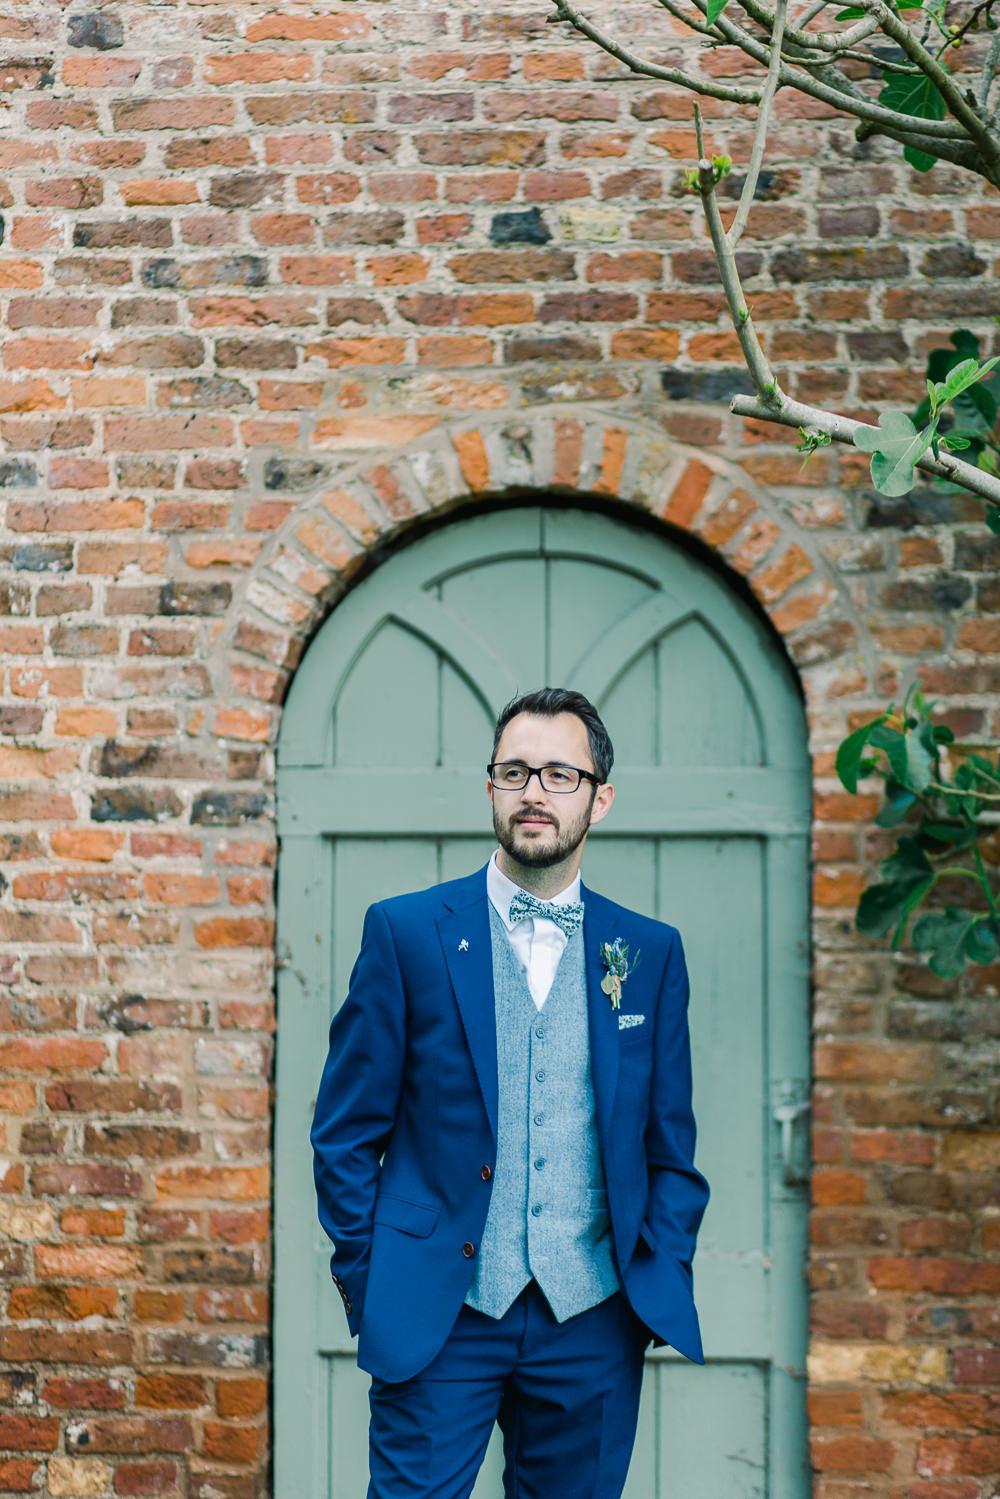 Groom Suit Navy Blue Waistcoat Bow Tie Saltmarshe Hall Wedding Jessica Davies Photography